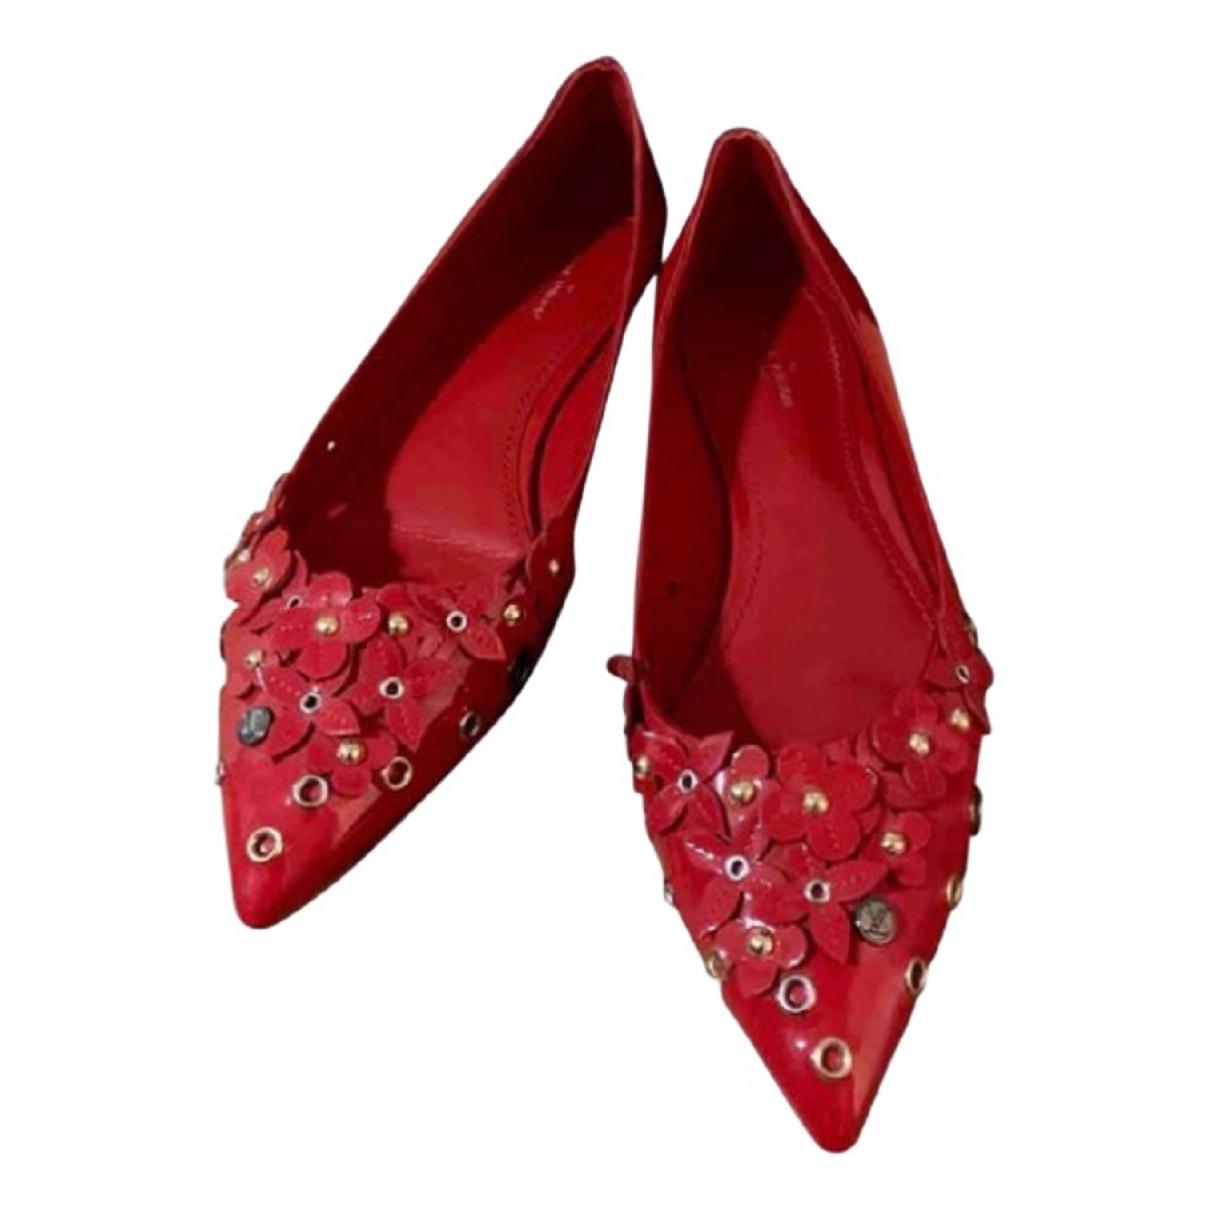 Louis Vuitton \N Red Patent leather Ballet flats for Women 39 EU